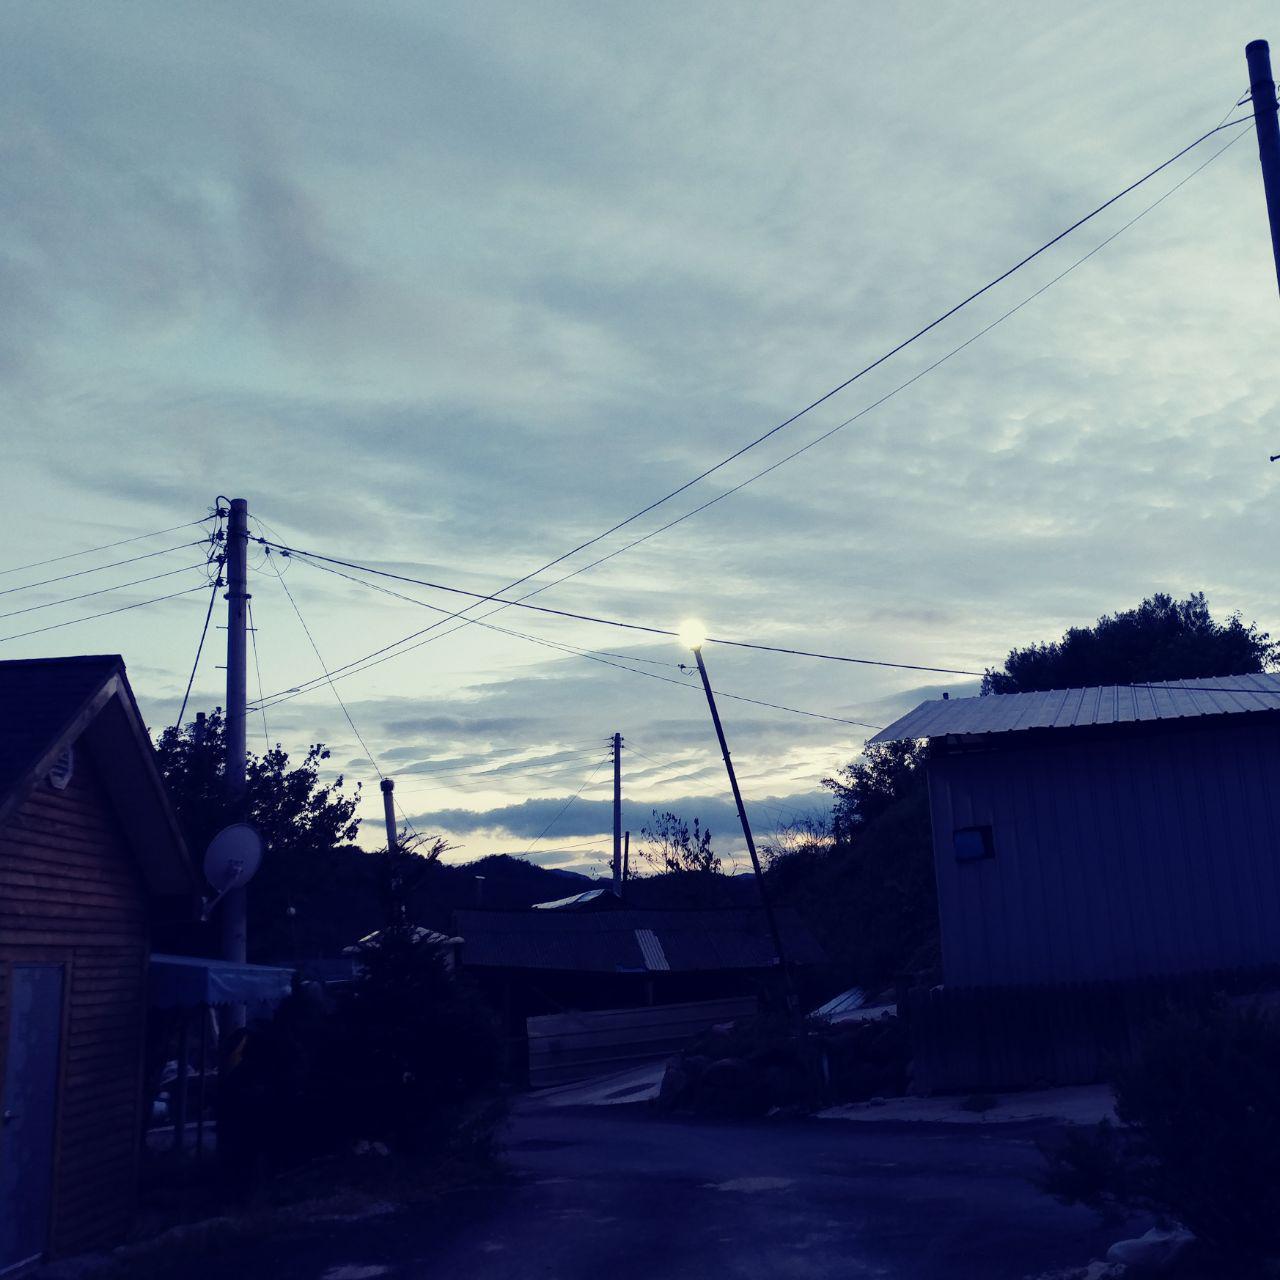 photo_2018-10-26_06-39-39 (3).jpg